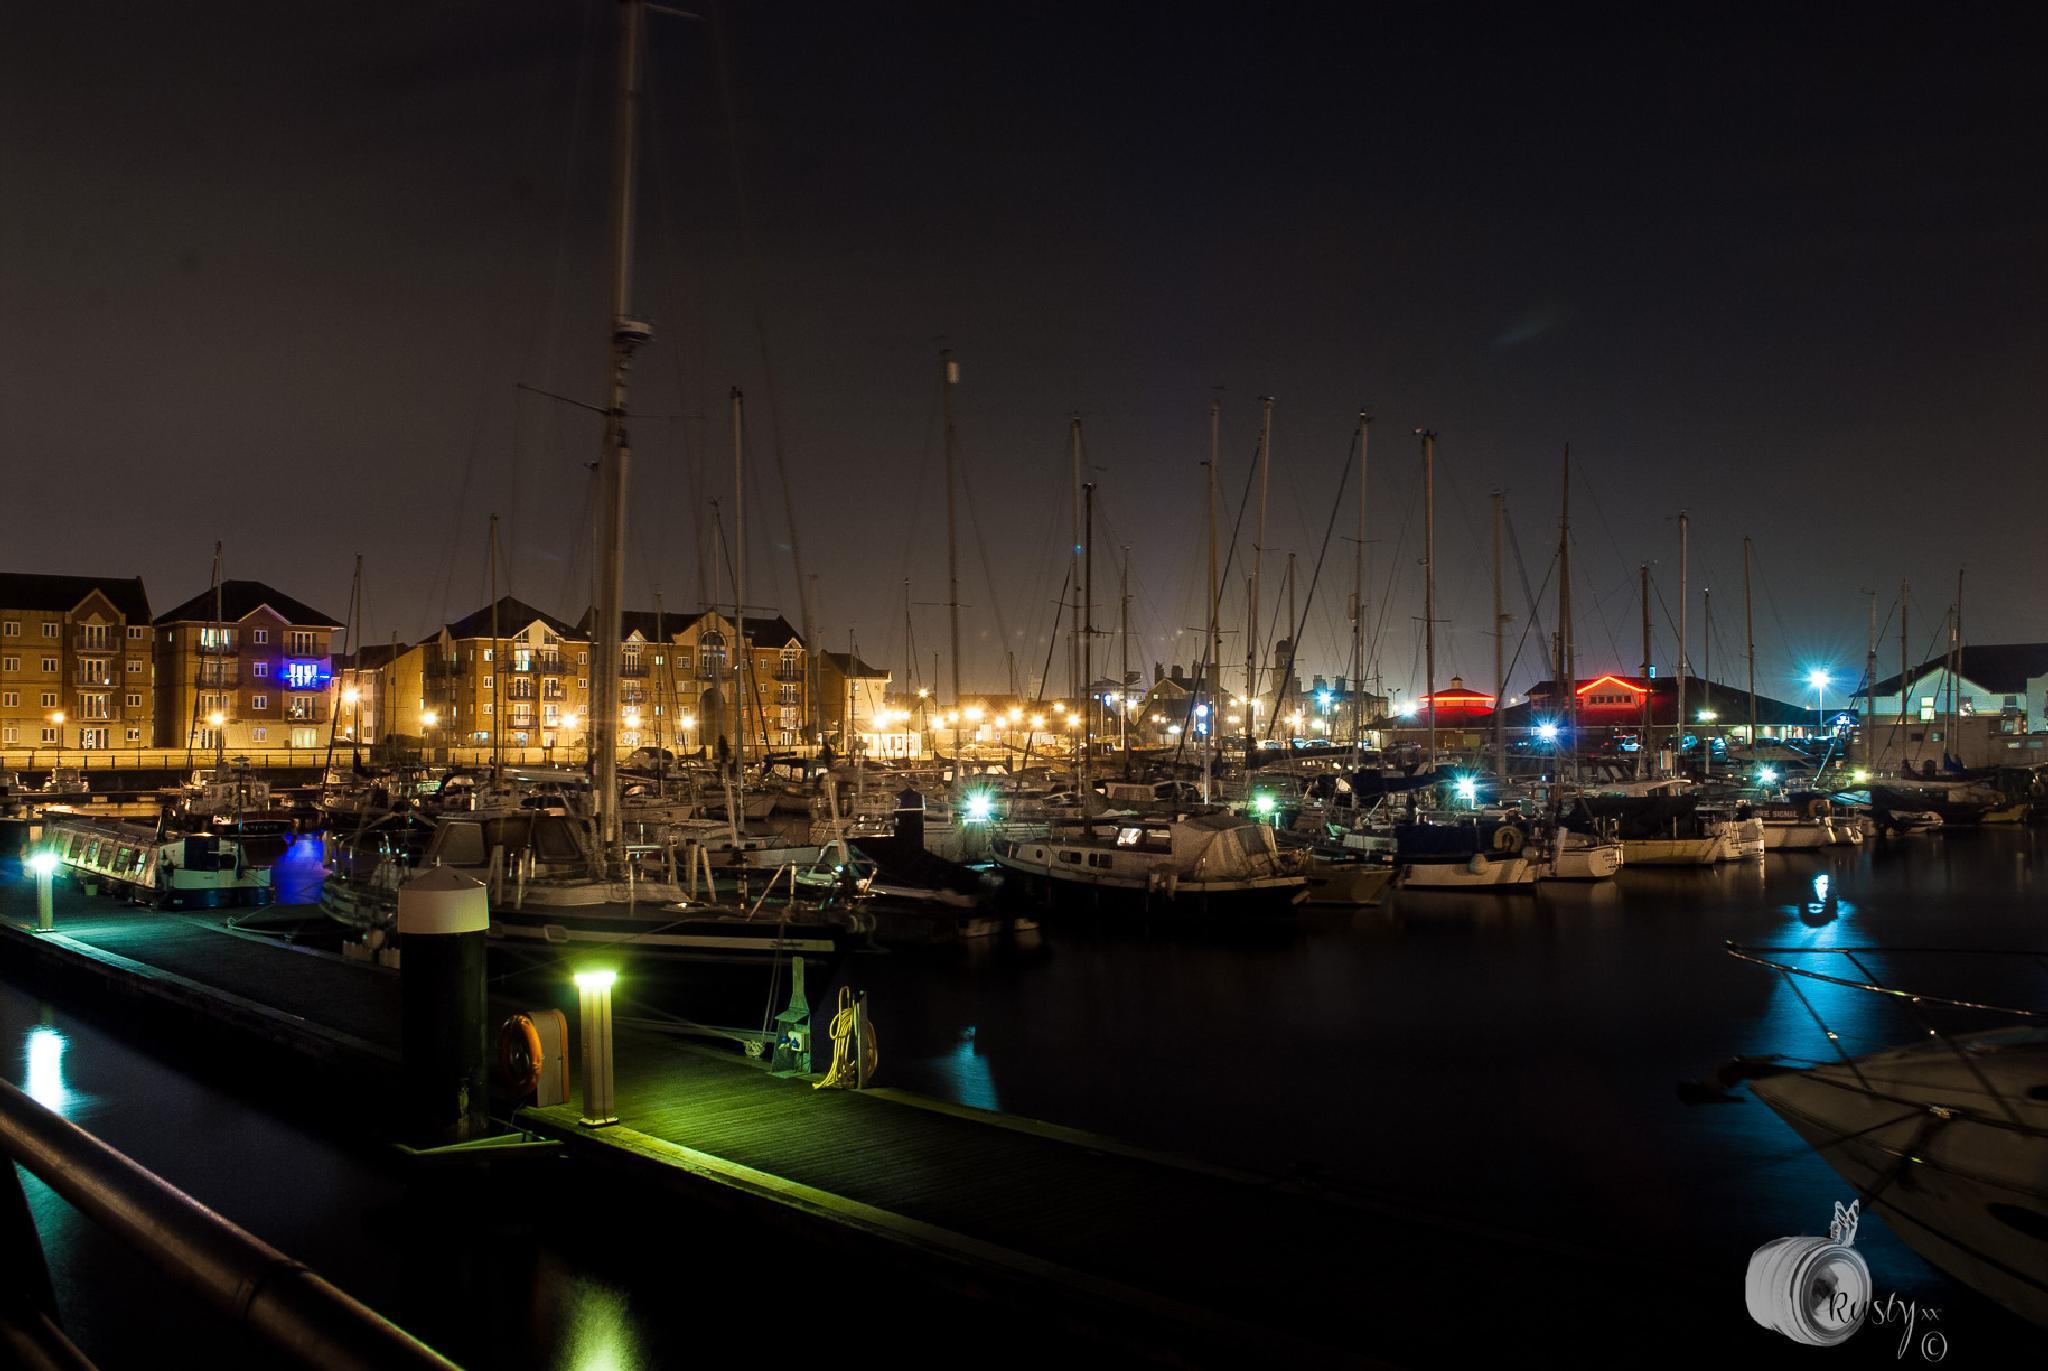 Night time at the marina. by NatureGirl